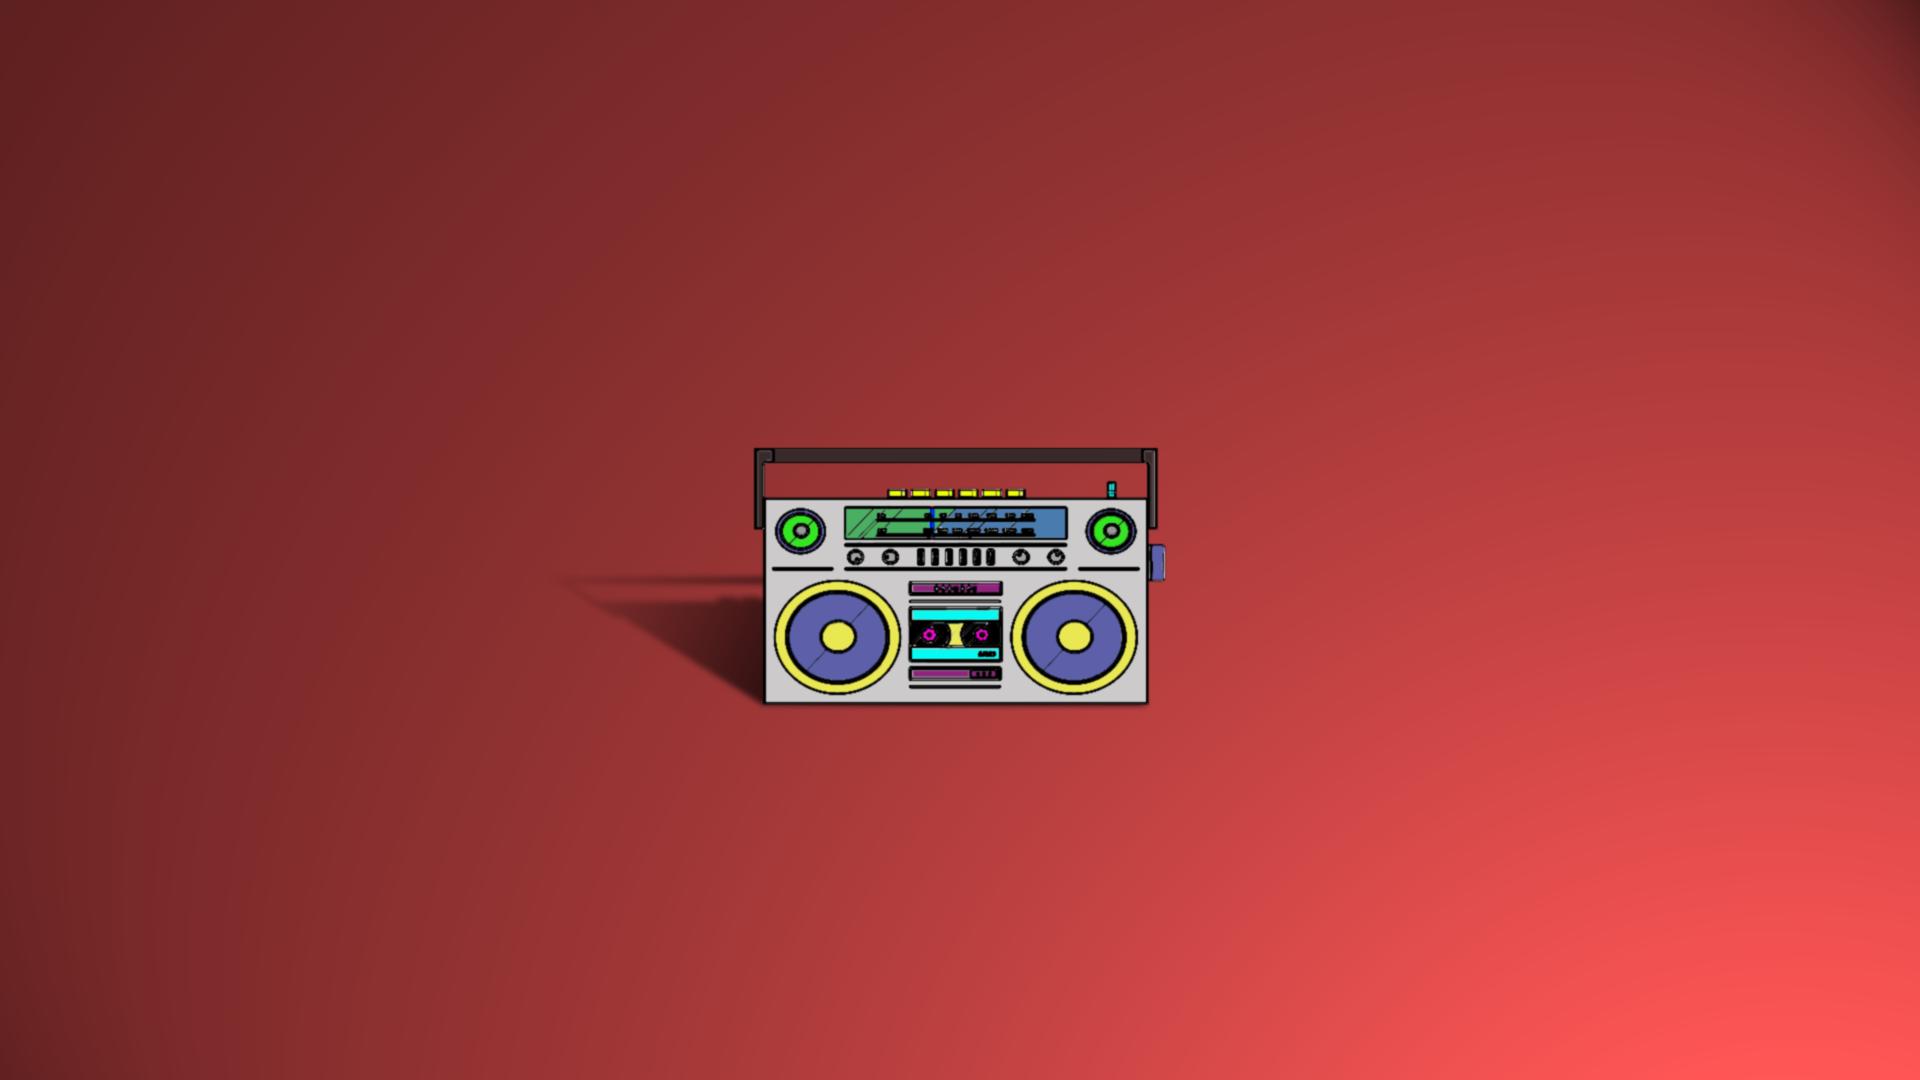 wallpaper boombox music colorful 1920x1080 gacuu 1451229